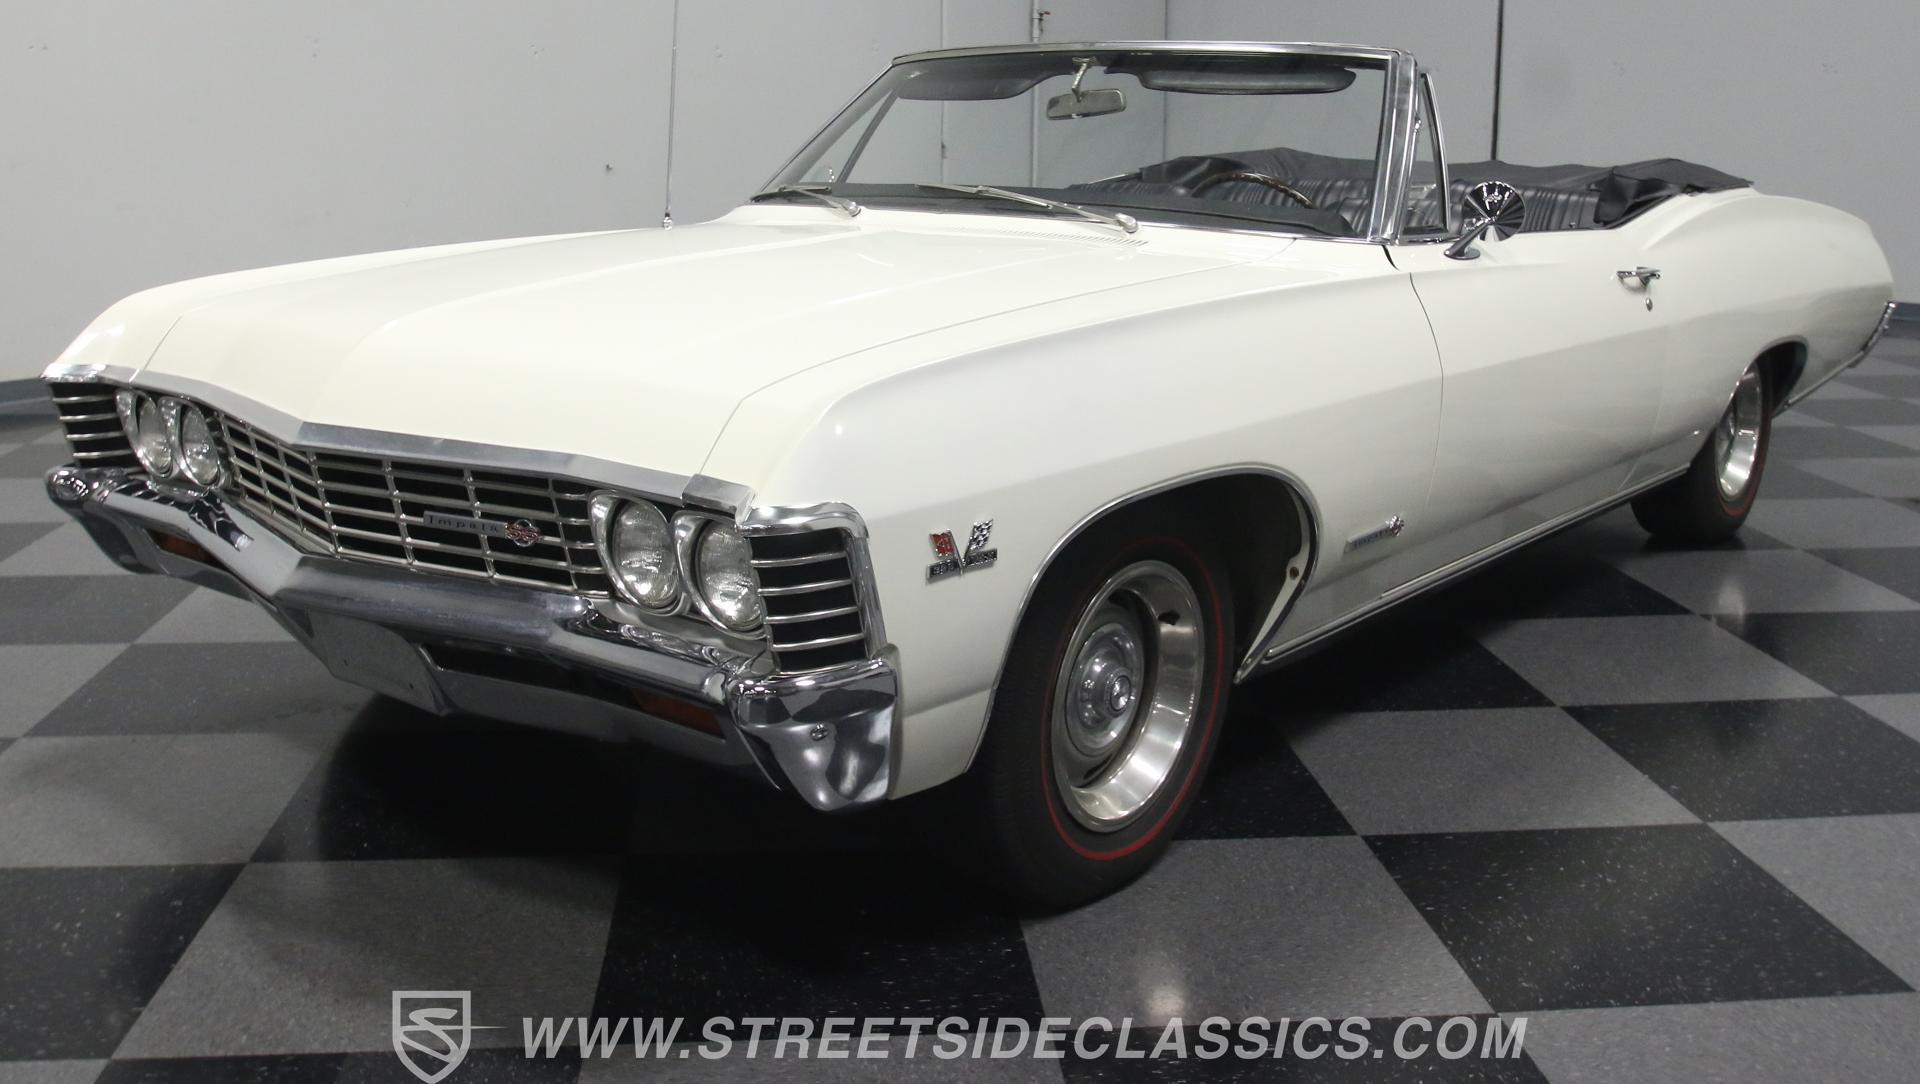 1967 chevrolet impala ss 396